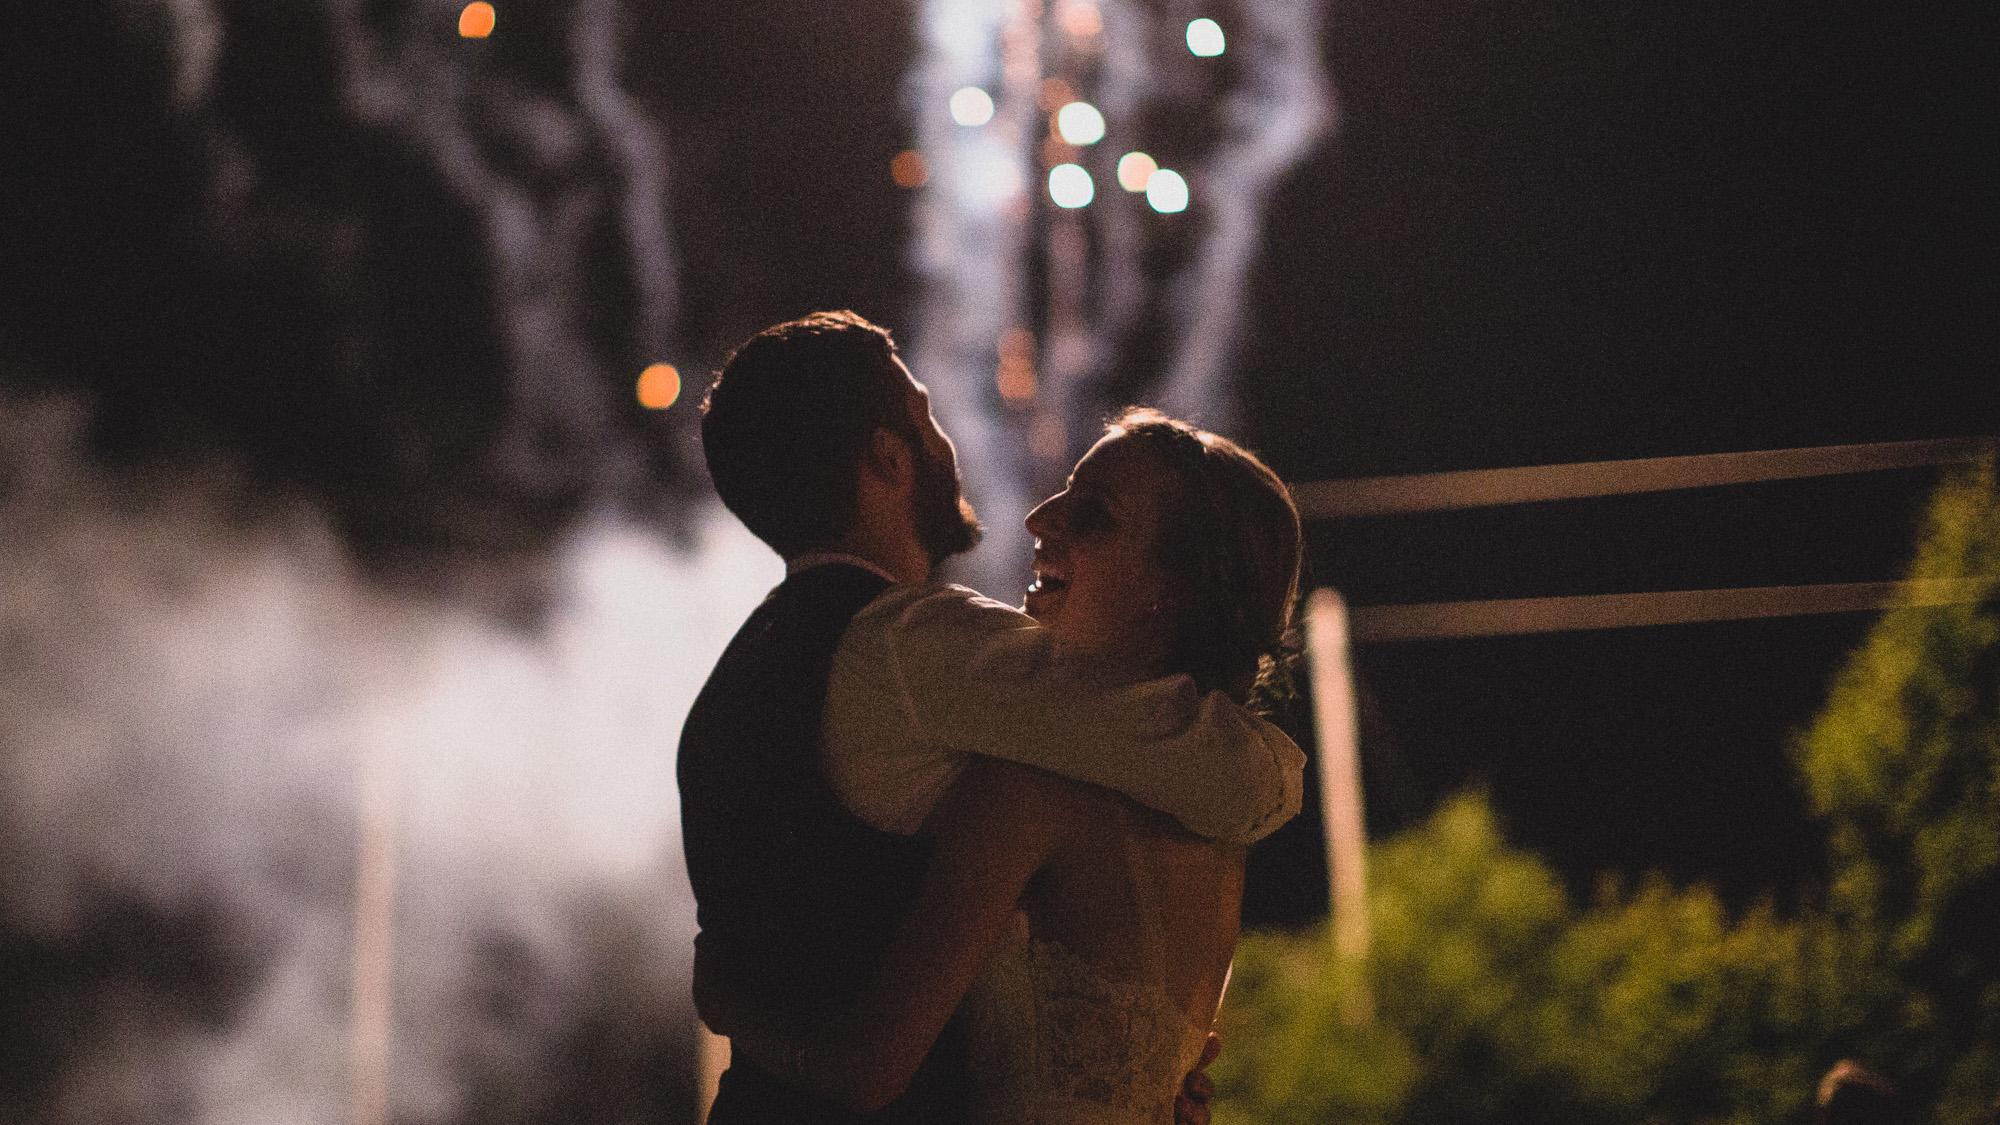 alec_vanderboom_springfield_missouri_wedding-0089.jpg